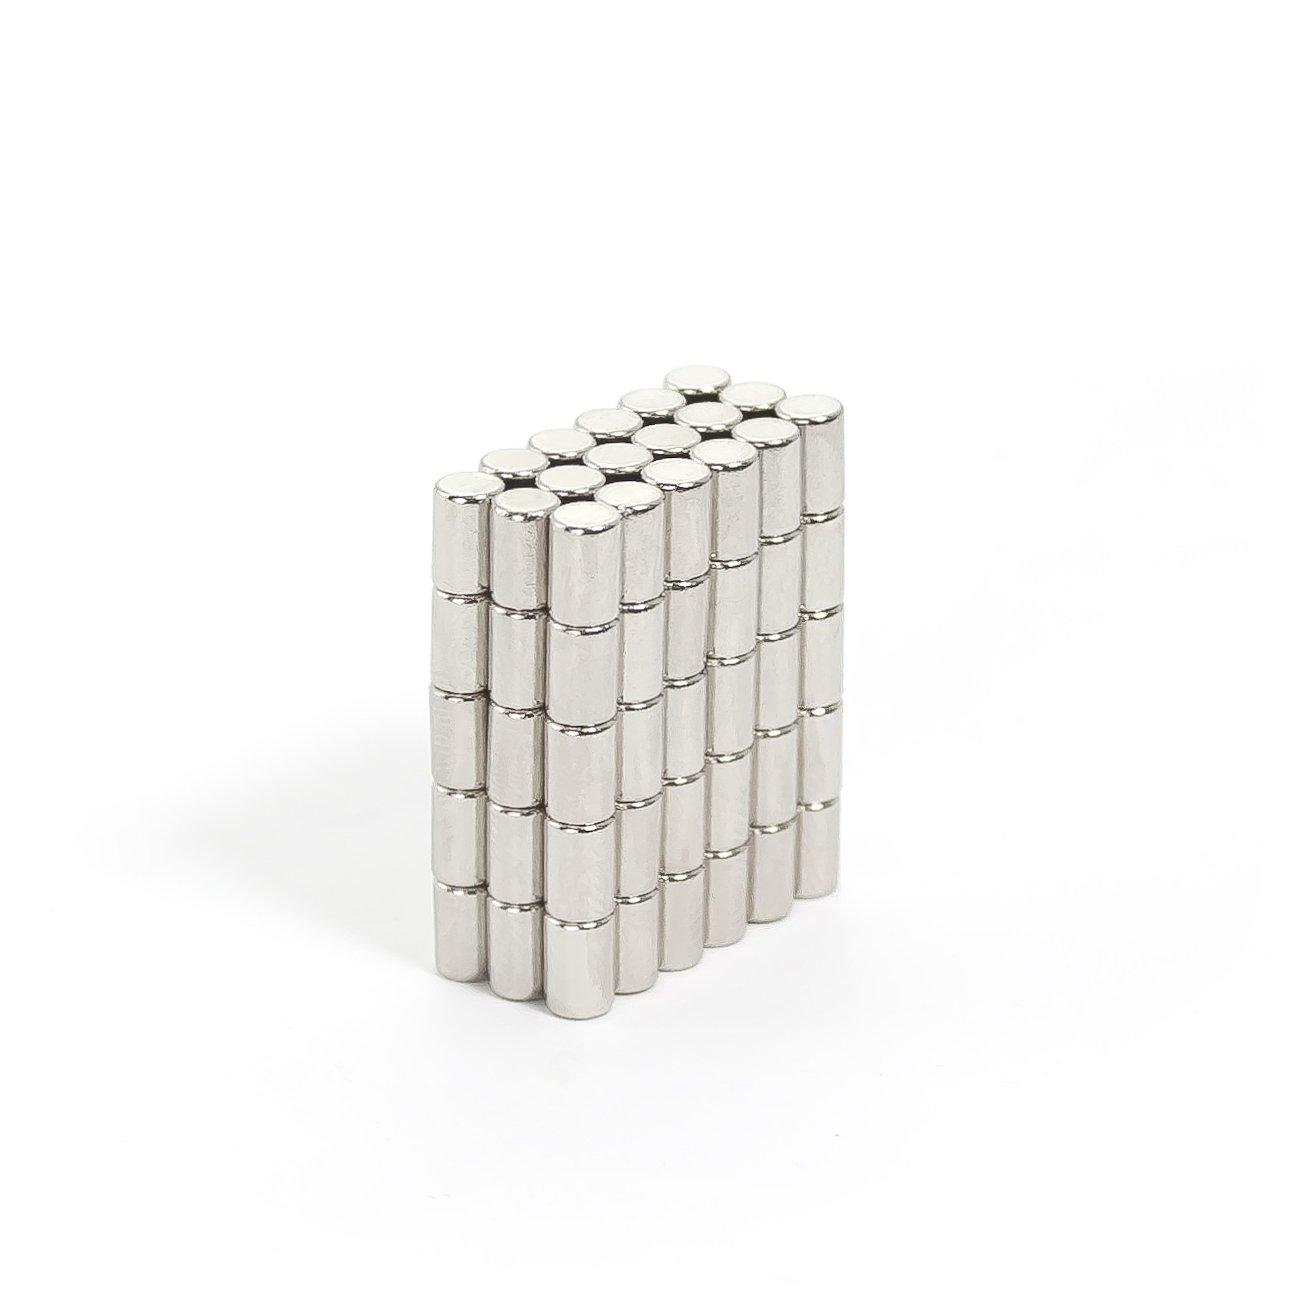 NEODYM LOriginale Oblique Unique 10 Mini Calamite Ultra Forti 4 x 6 mm